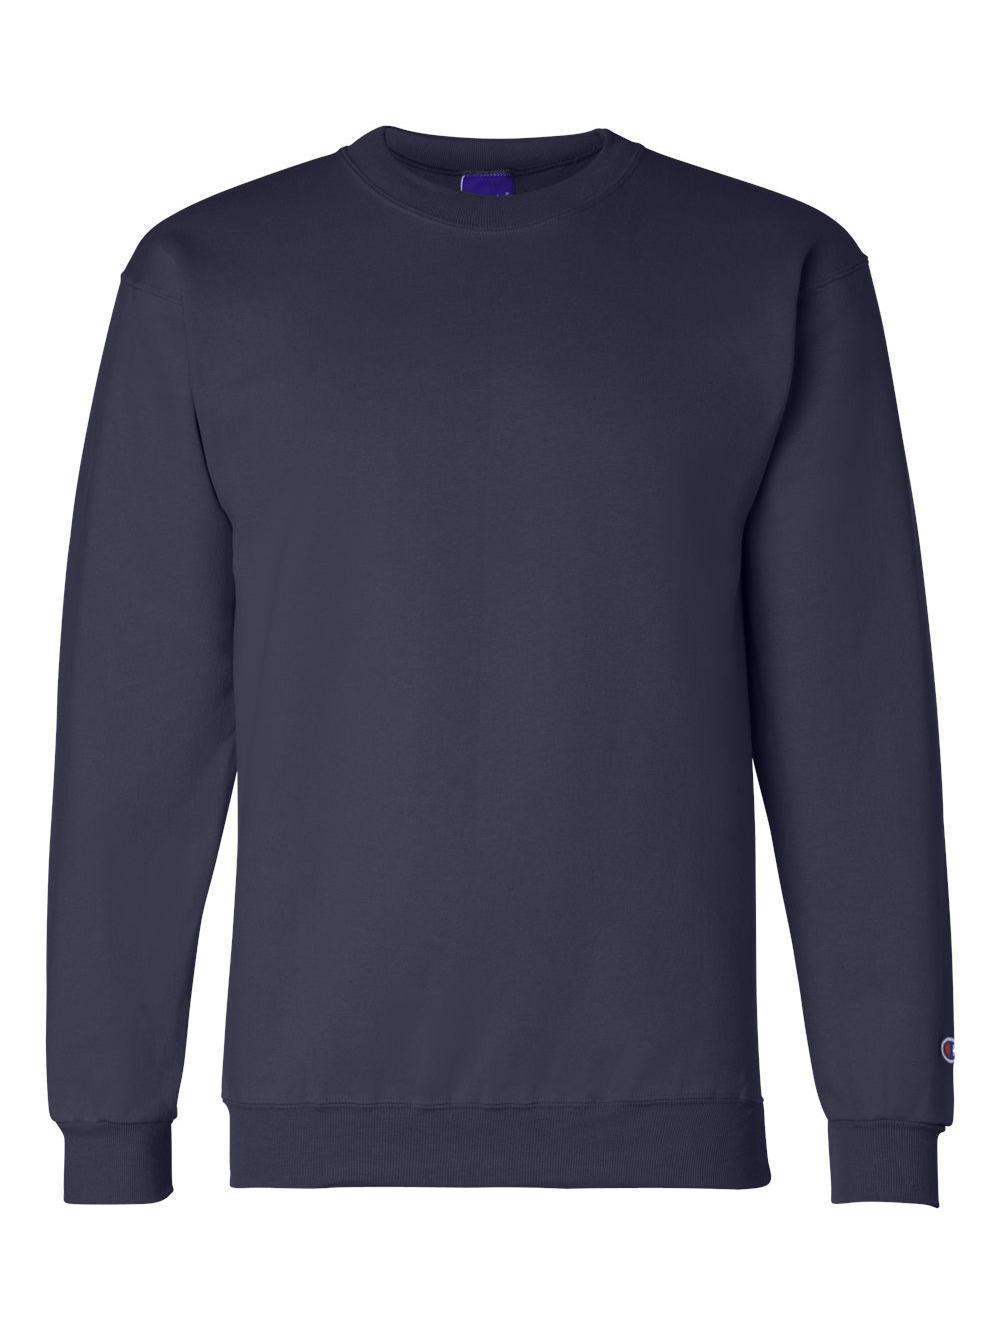 Champion-Double-Dry-Eco-Crewneck-Sweatshirt-S600 thumbnail 18